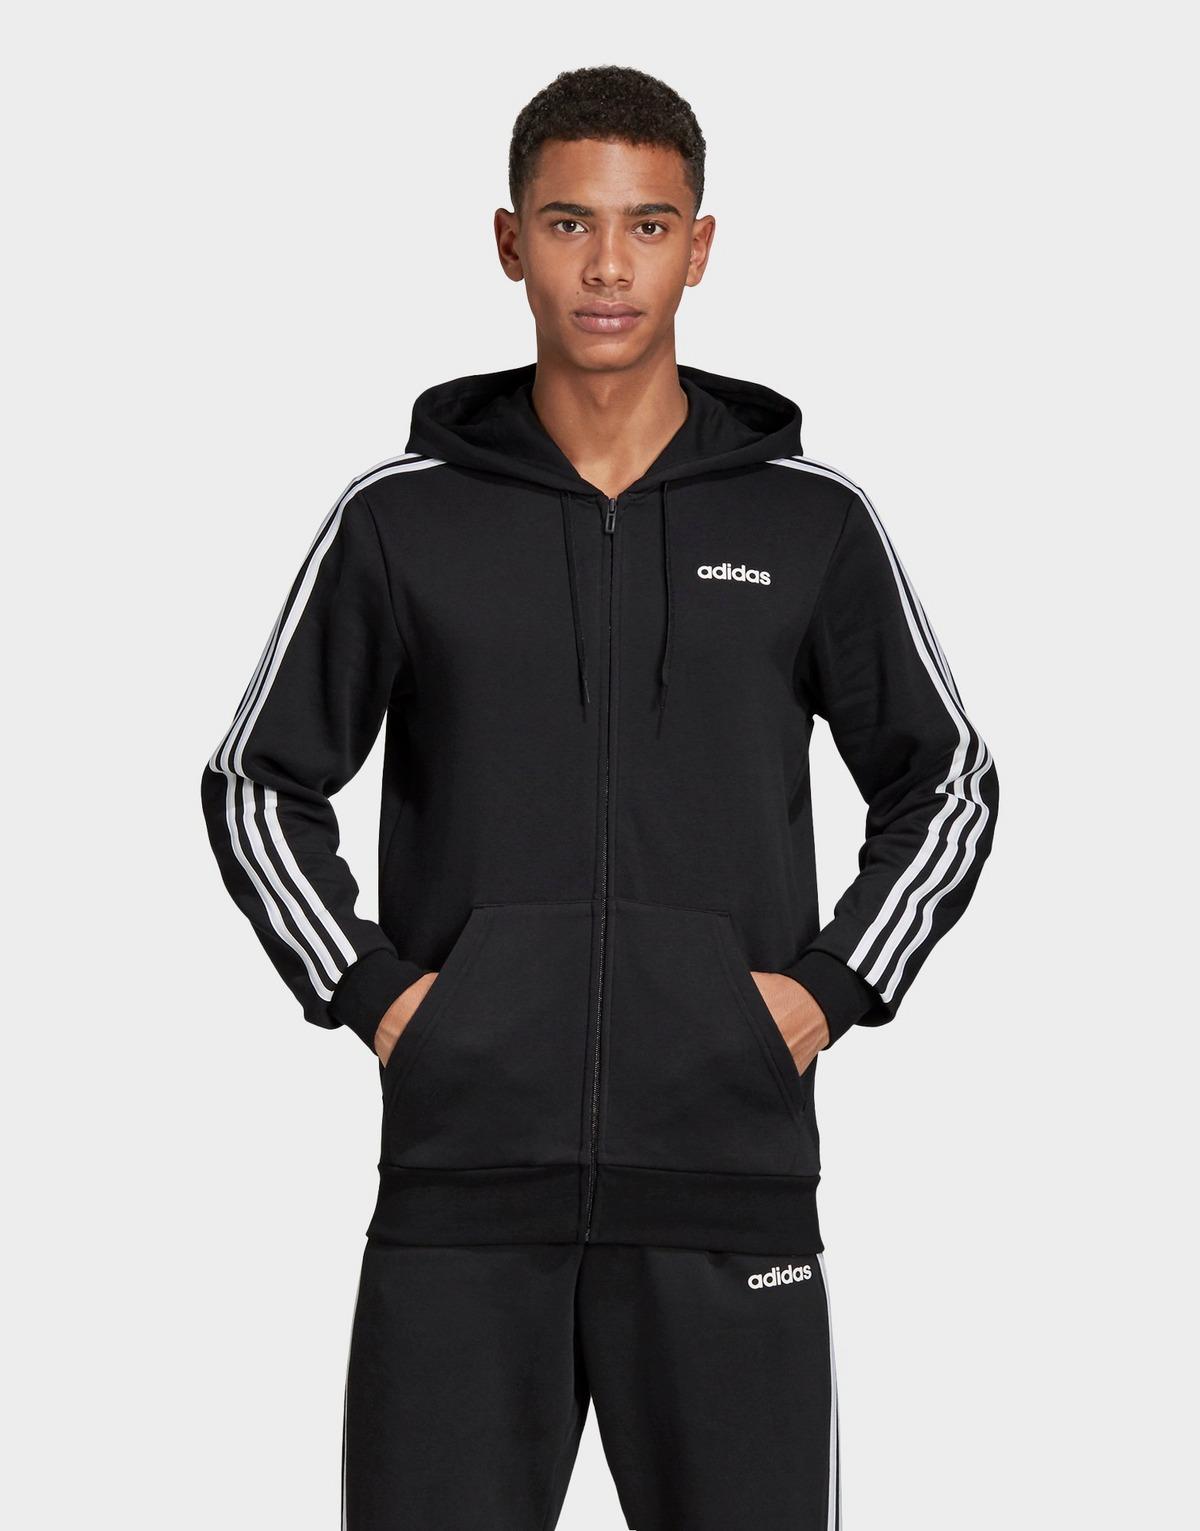 Adidas Performance Essentials 3-stripes Fleece Hoodie